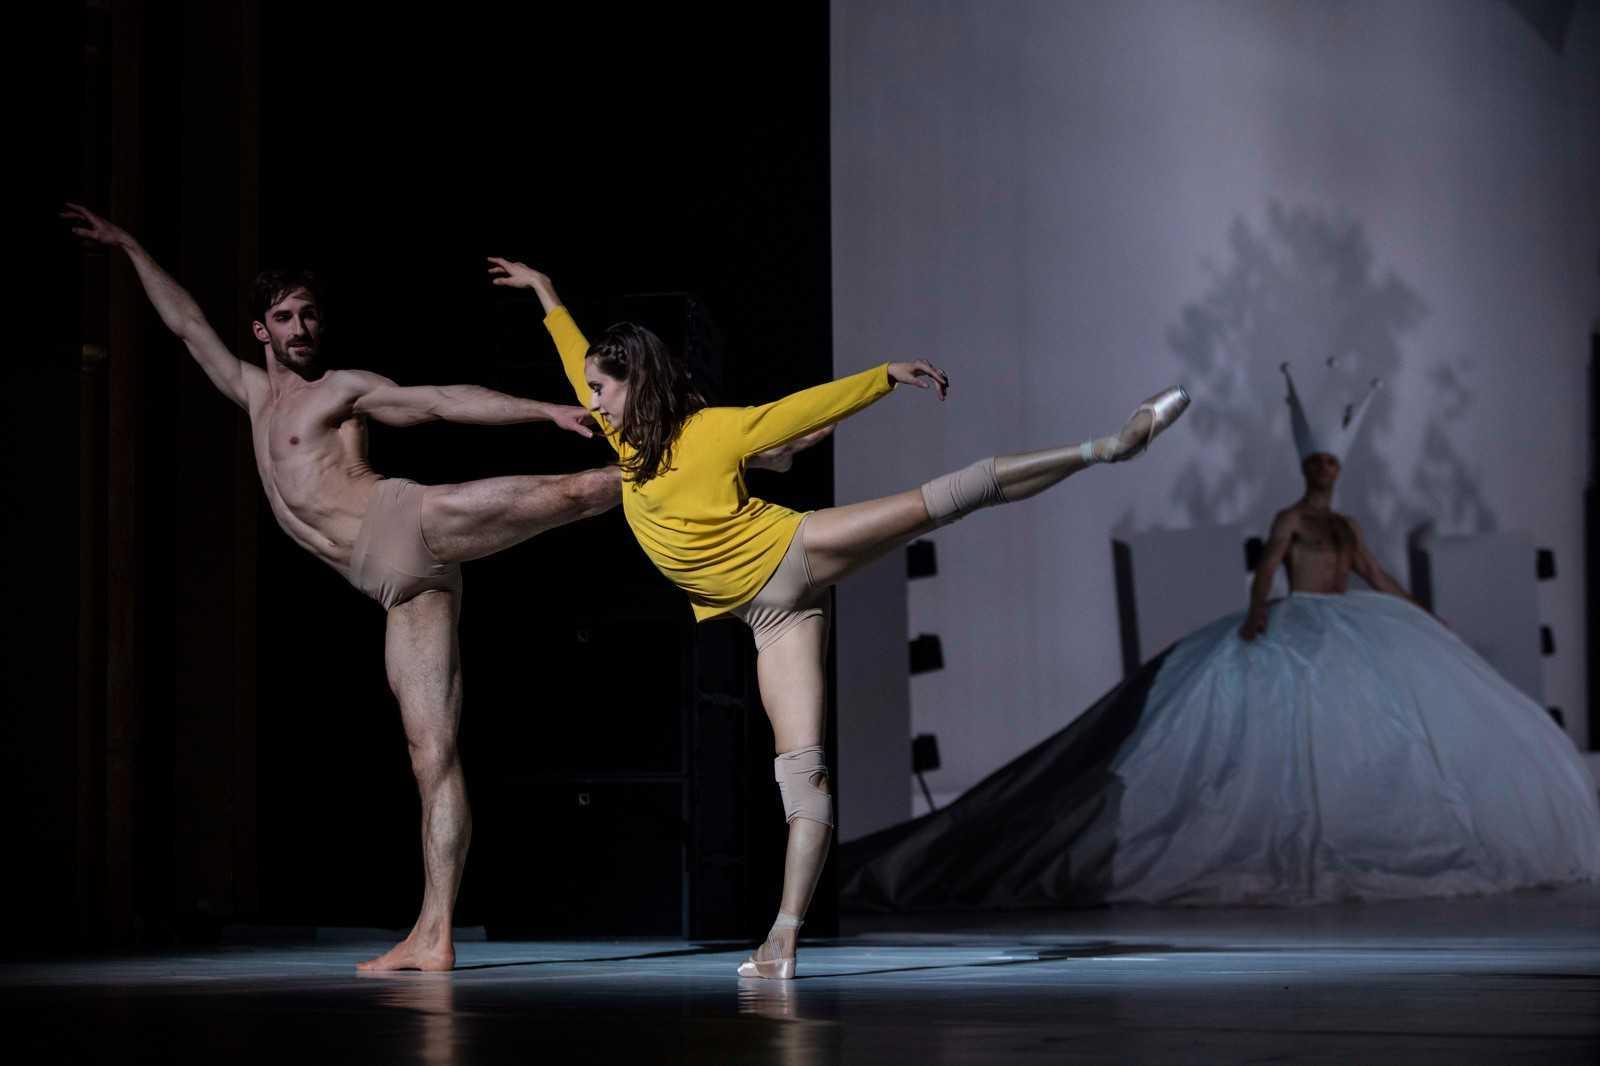 Ann Ray / Opéra national de Paris